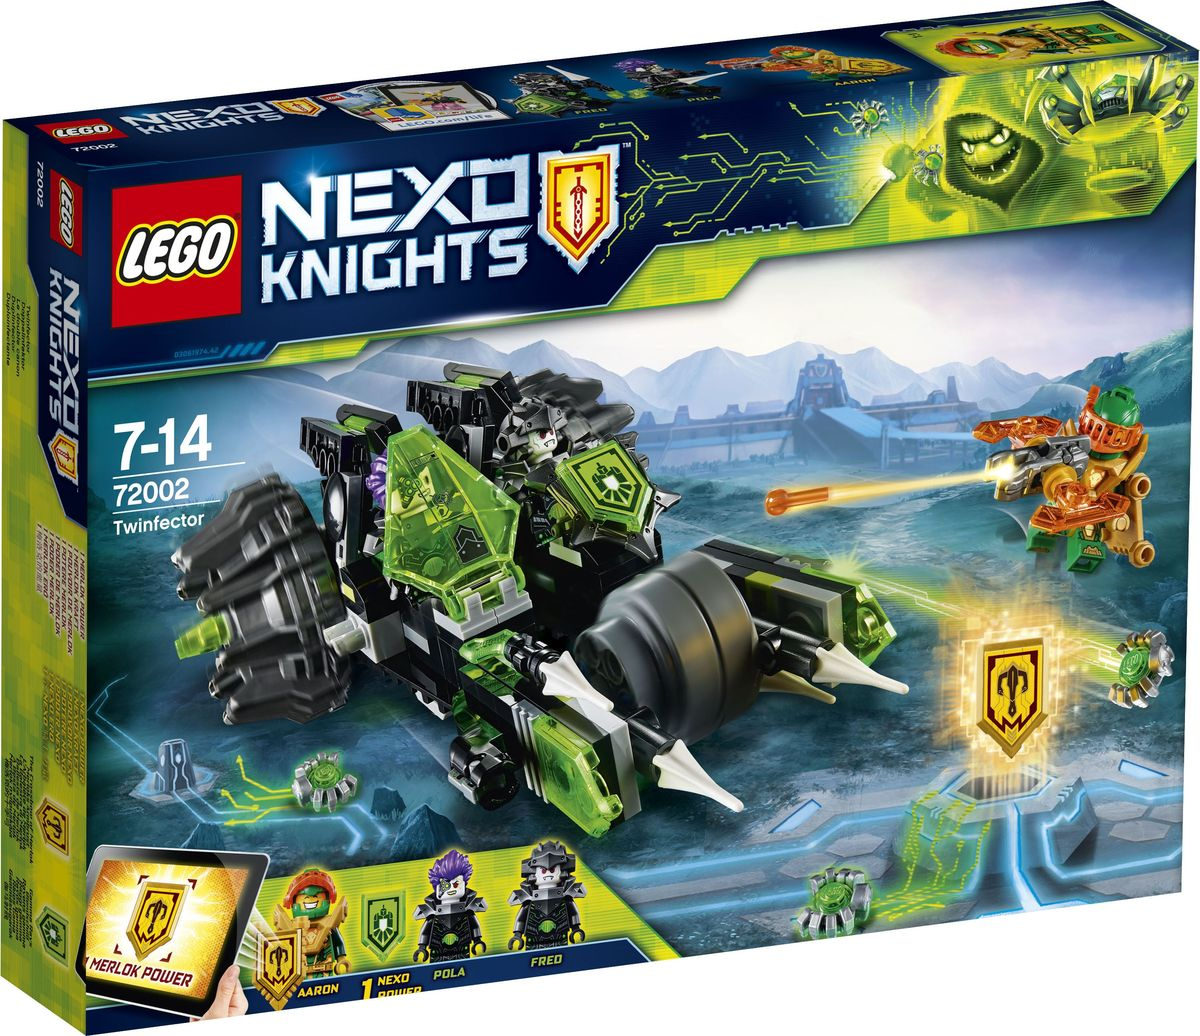 LEGO Nexo Knights Конструктор Боевая машина близнецов 72002 lego lego nexo knights 70334 предводитель монстров – абсолютная сила